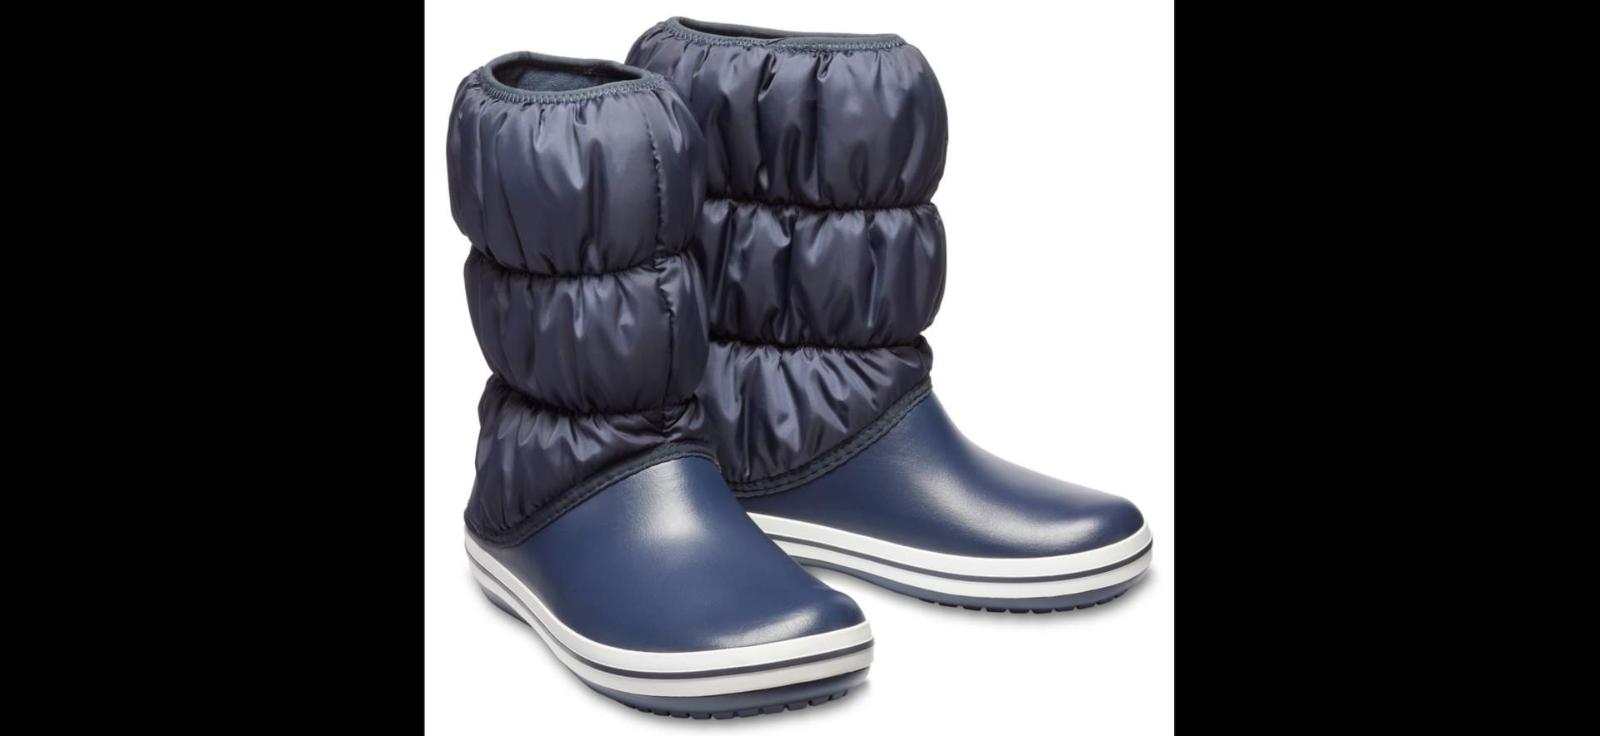 Crocs Winter Puff Warm Lined Winter Snow Soft Fashion Fashion Fashion Damenschuhe Stiefel Größe 3-9 d4a057